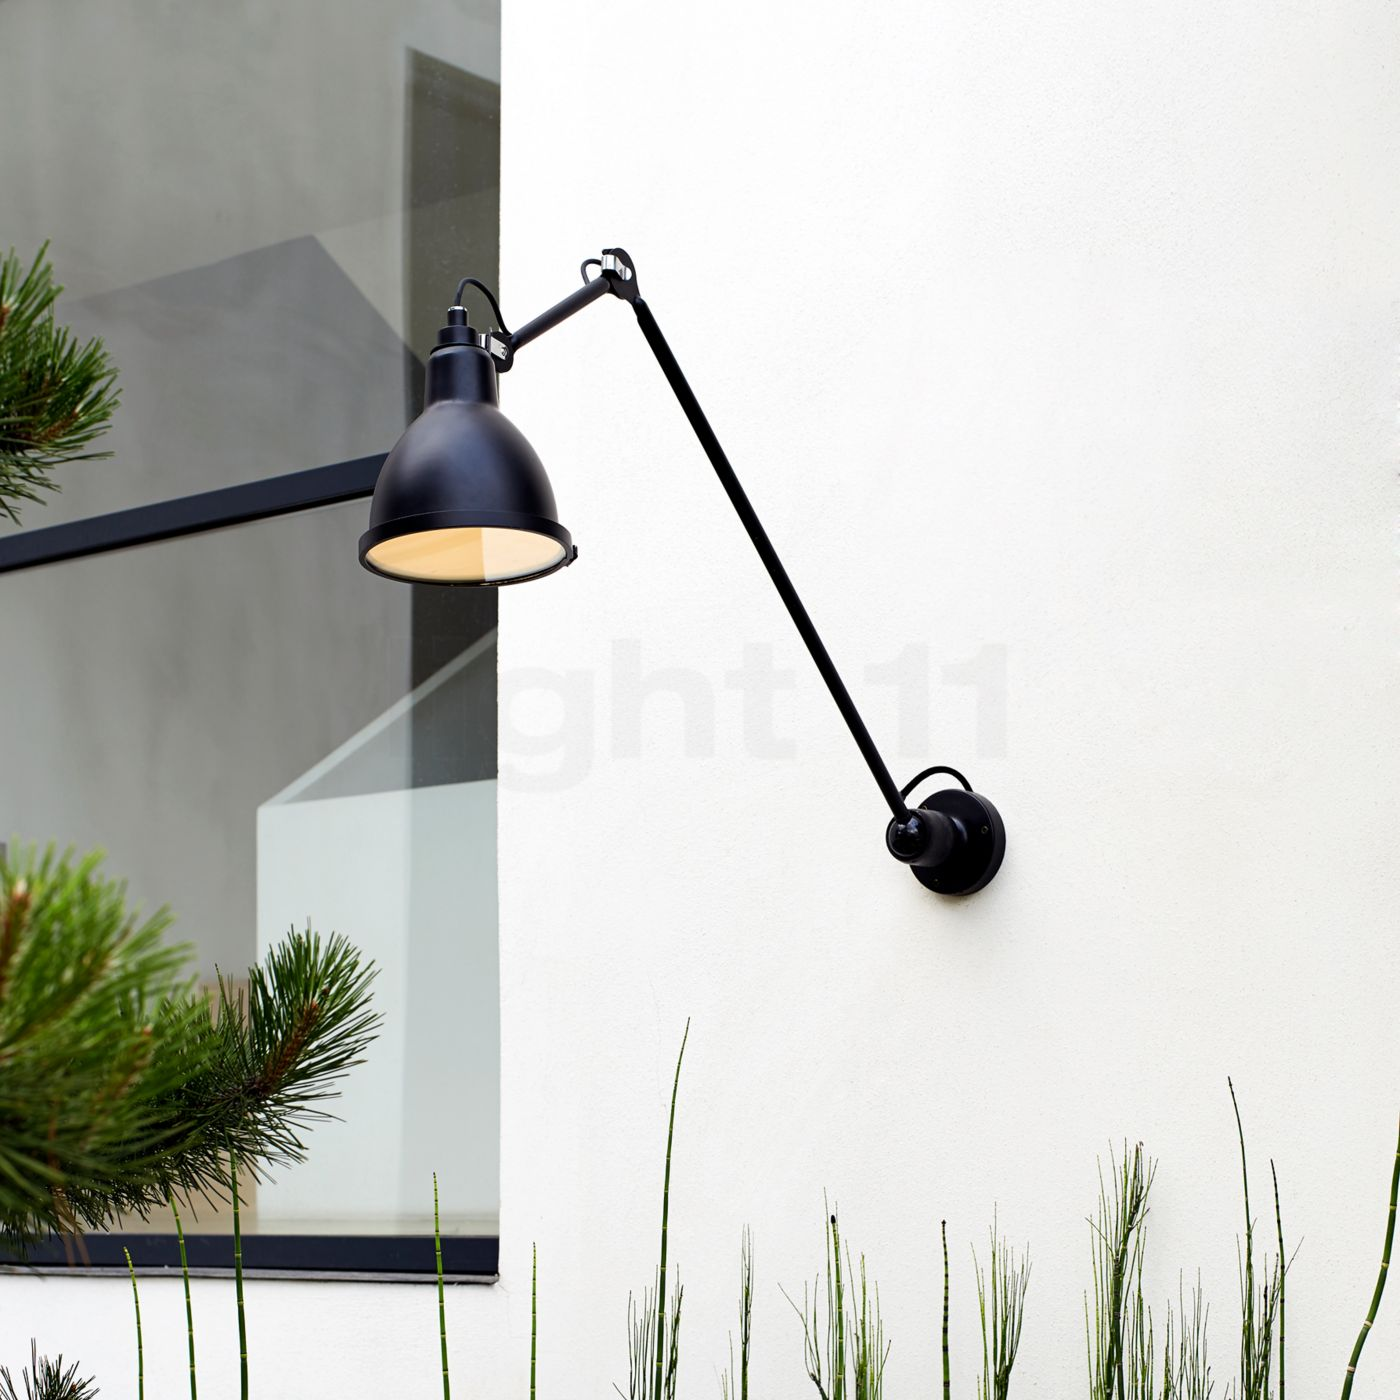 DCW Lampe Gras No 304 XL 75 Outdoor Seaside Wall light Wall lights